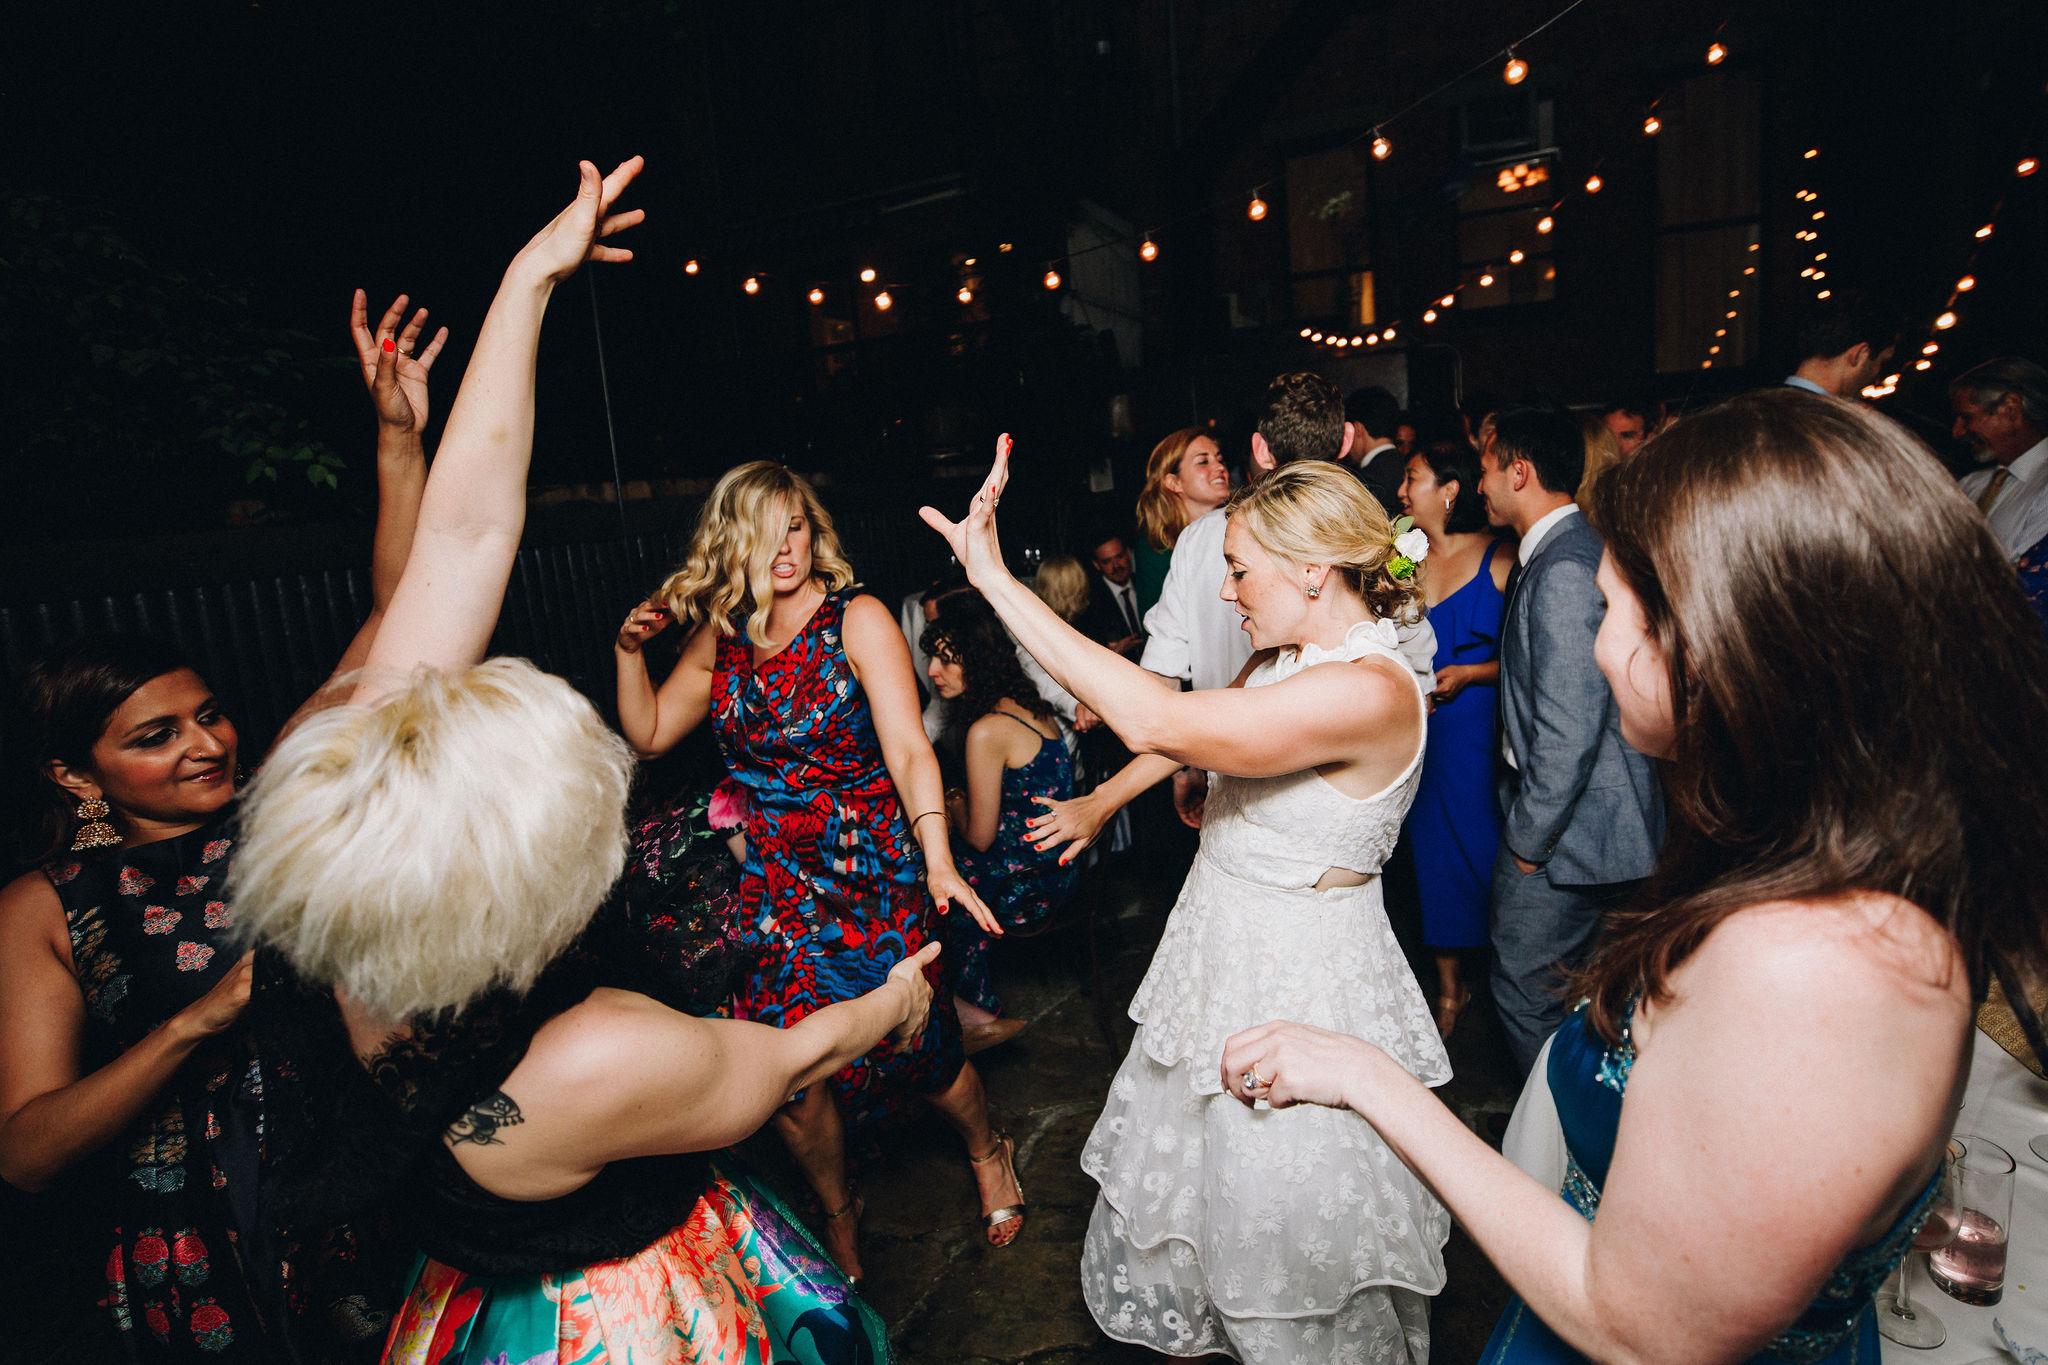 nyc wedding planner